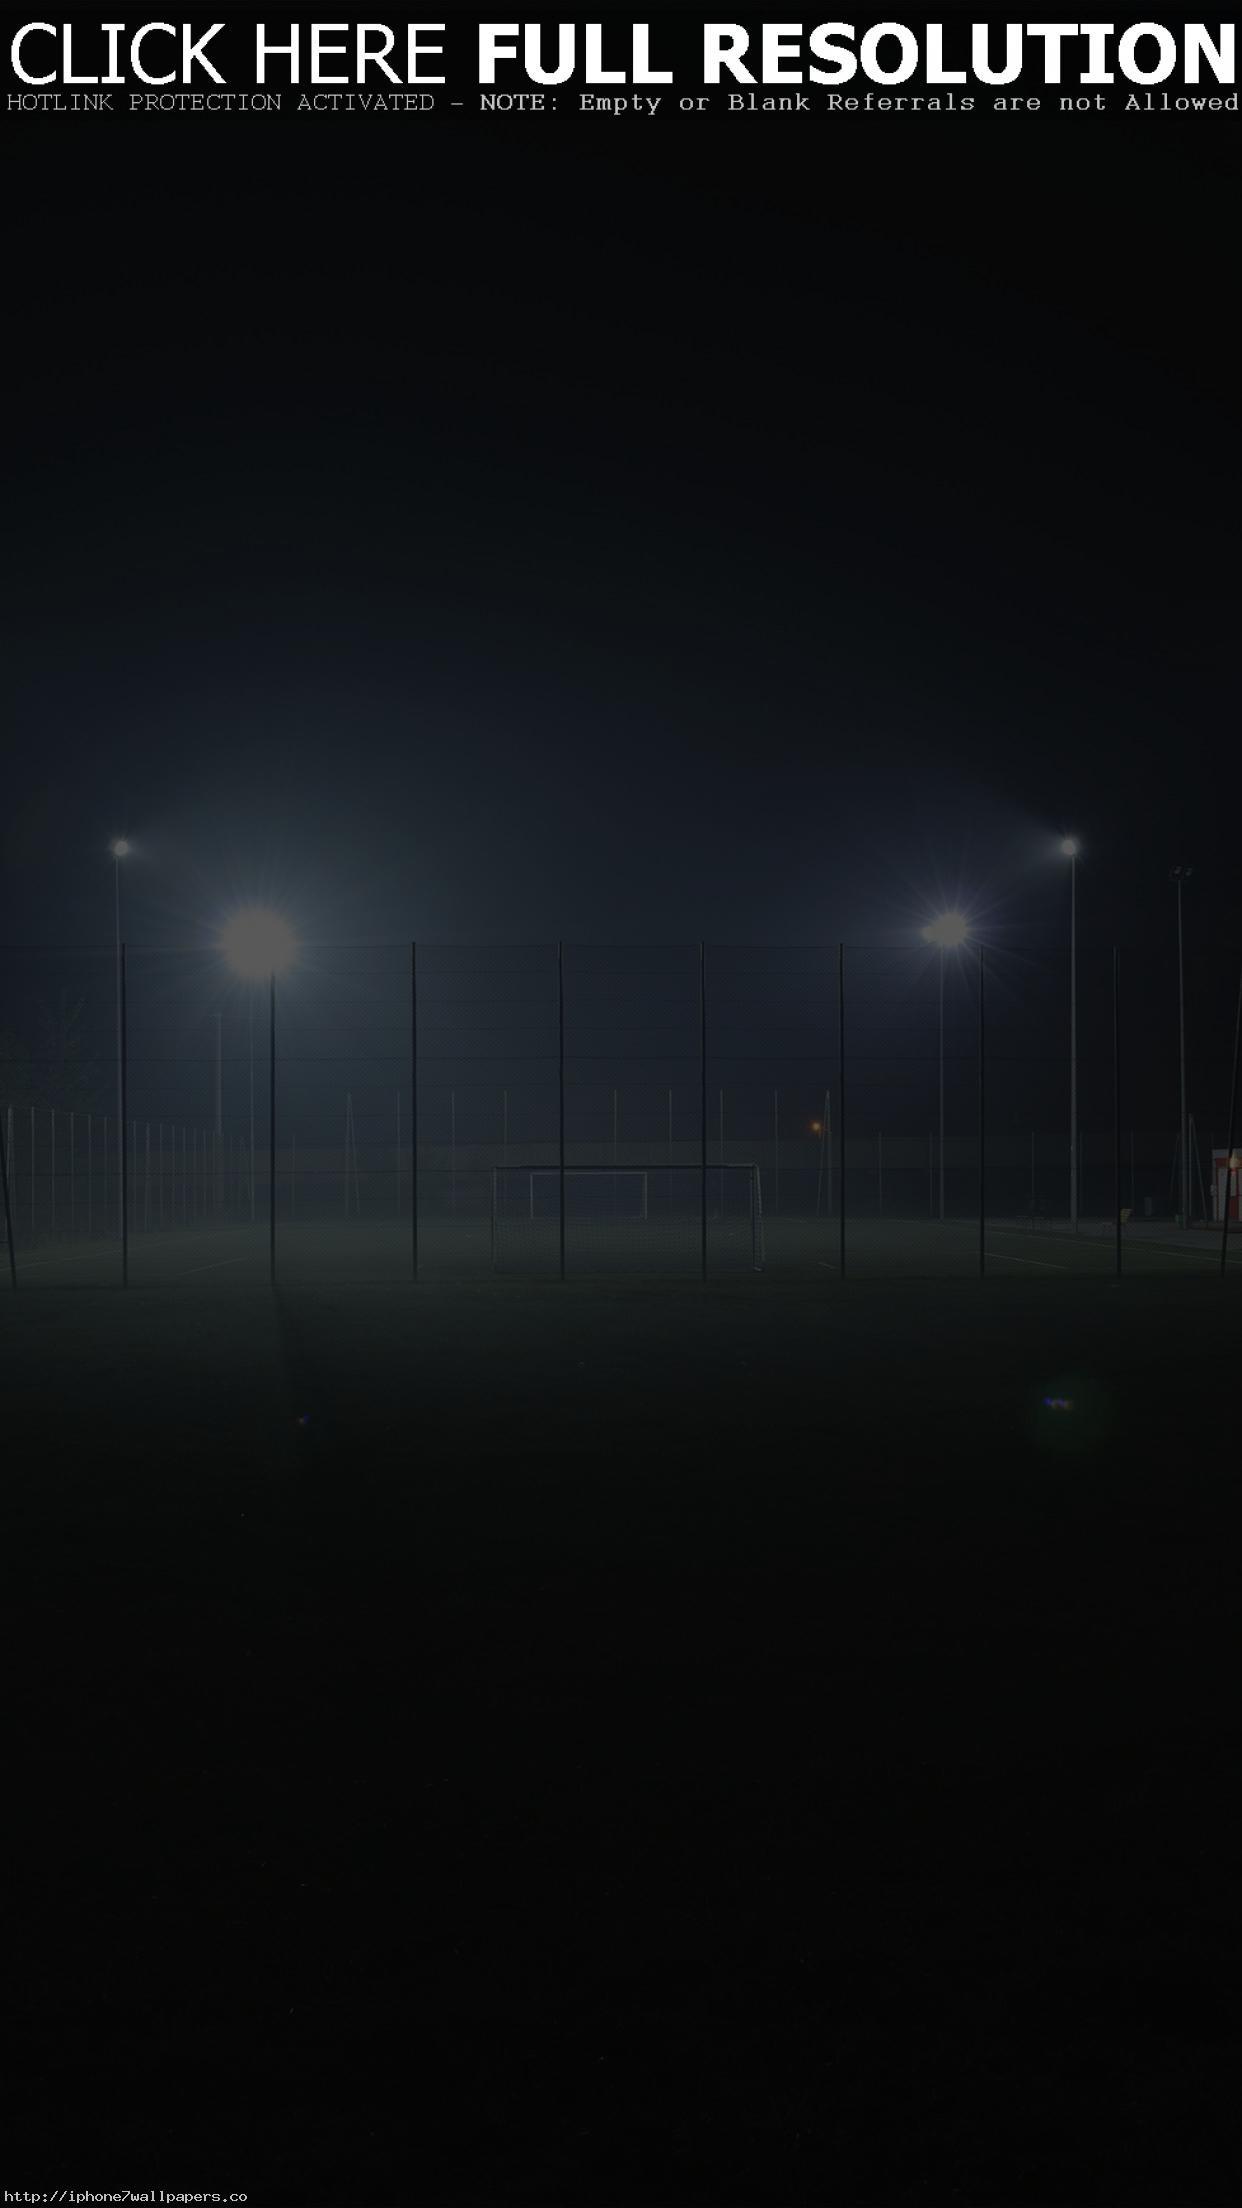 Soccer Field City Night Light Dark Android wallpaper – Android HD wallpapers